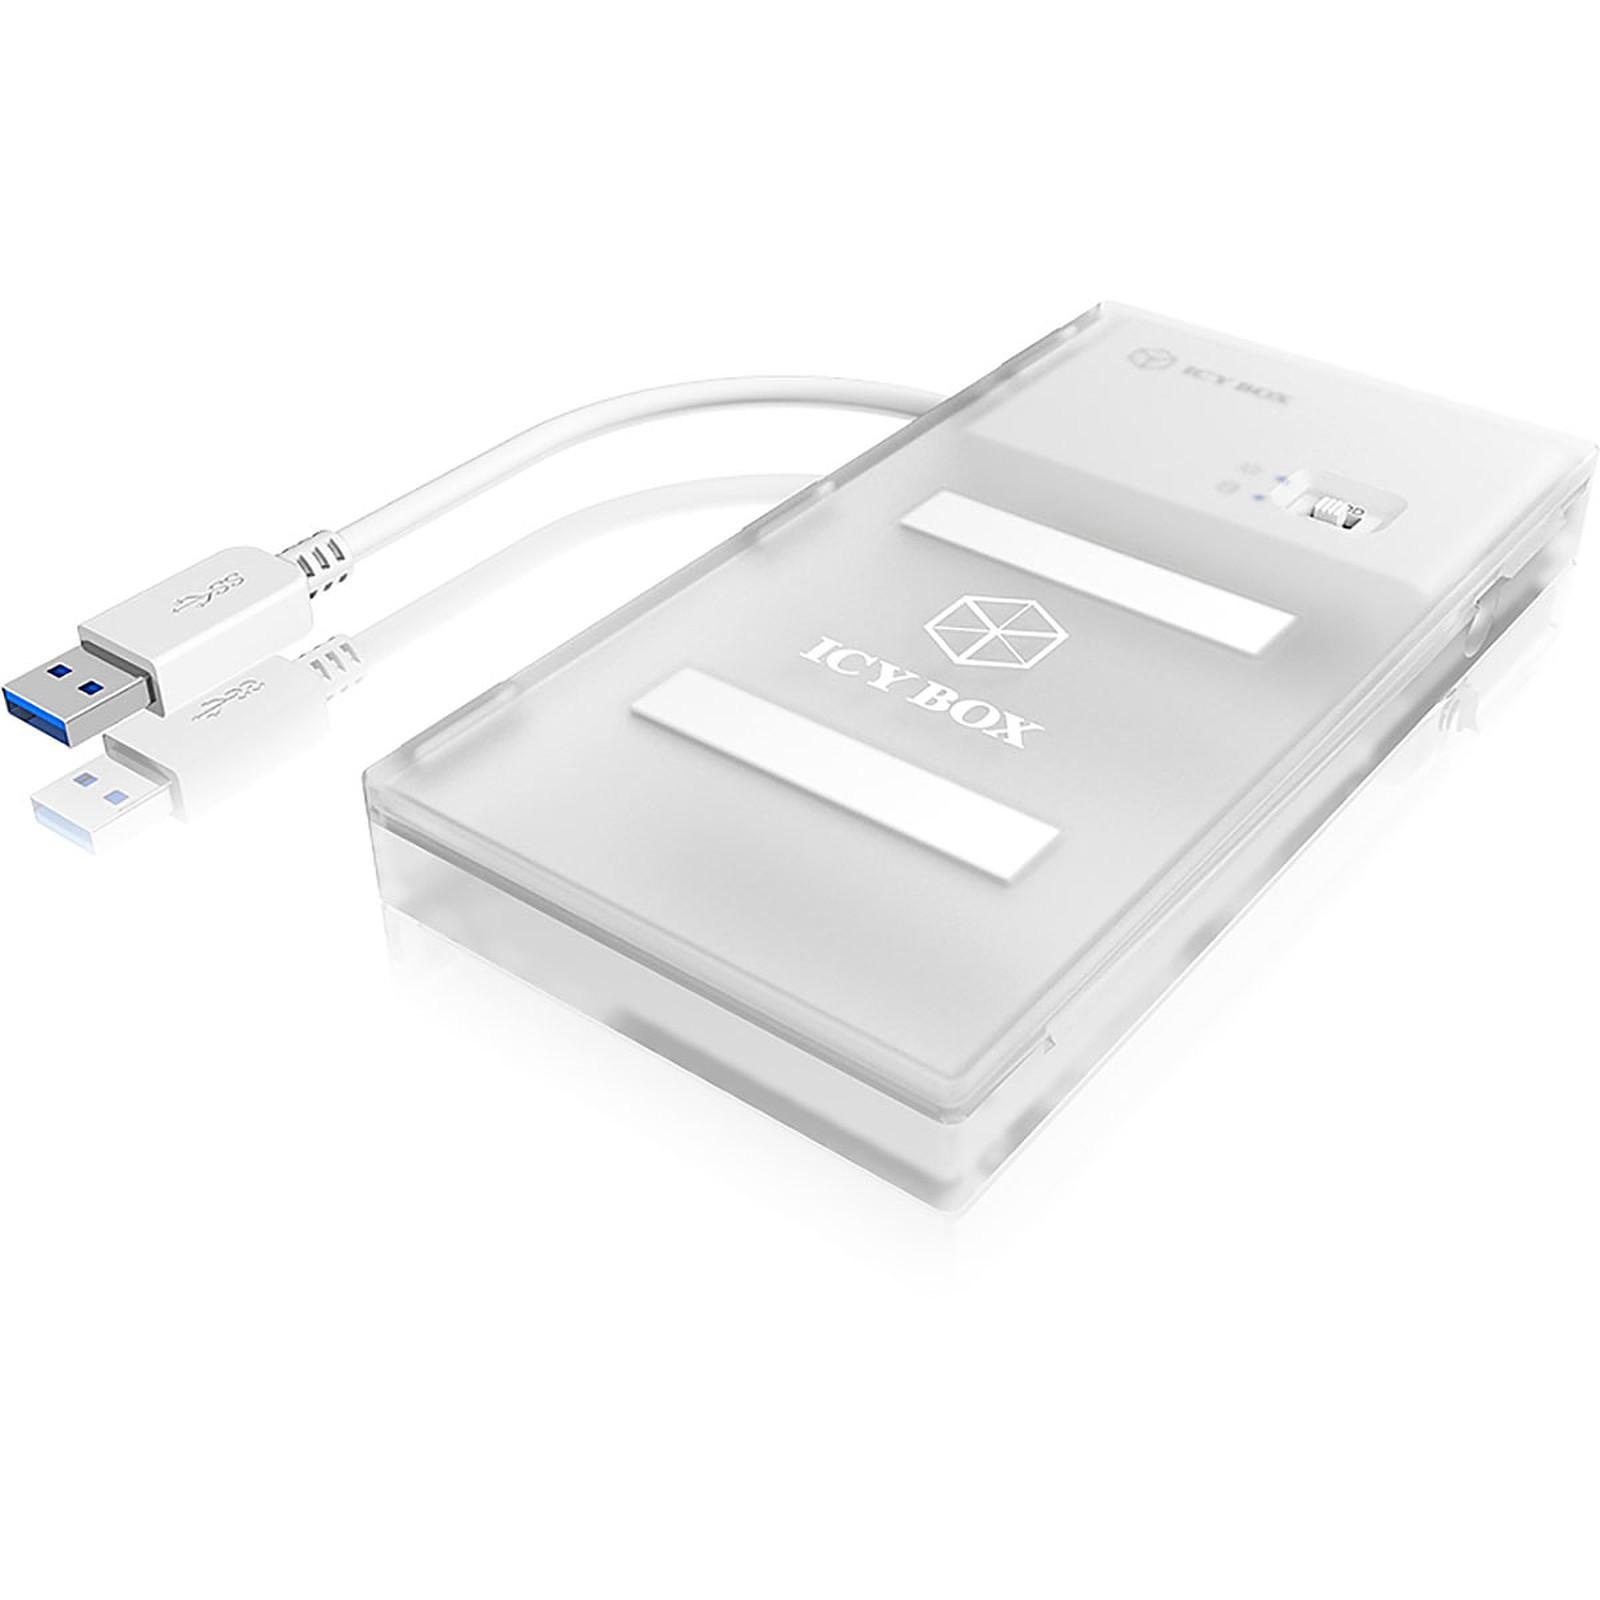 Icy BOX IB-DK404